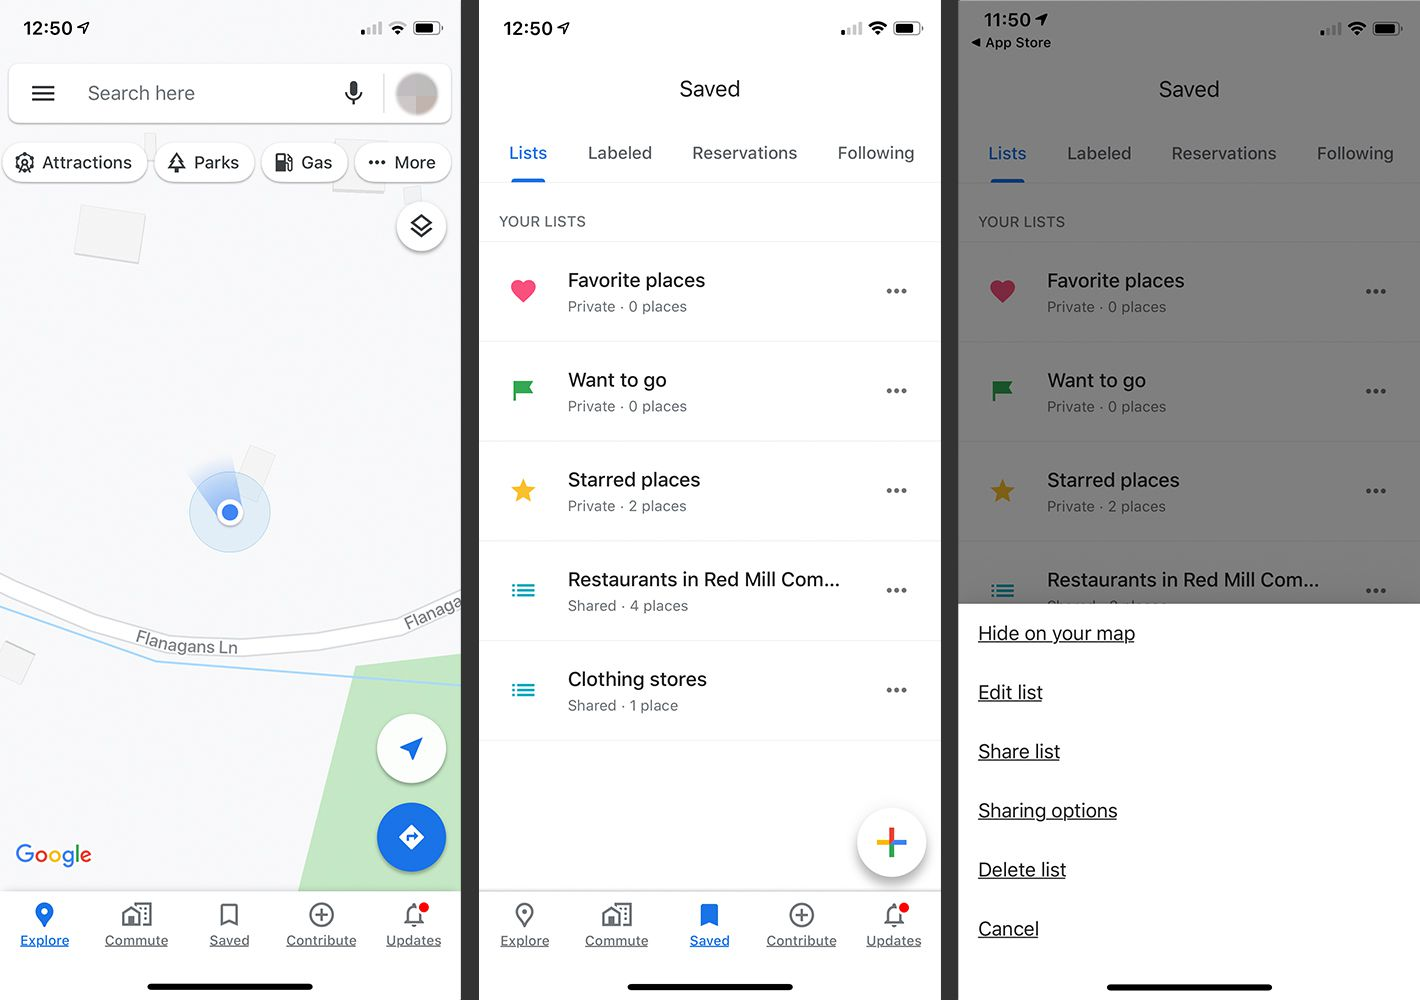 Google Maps app home screen